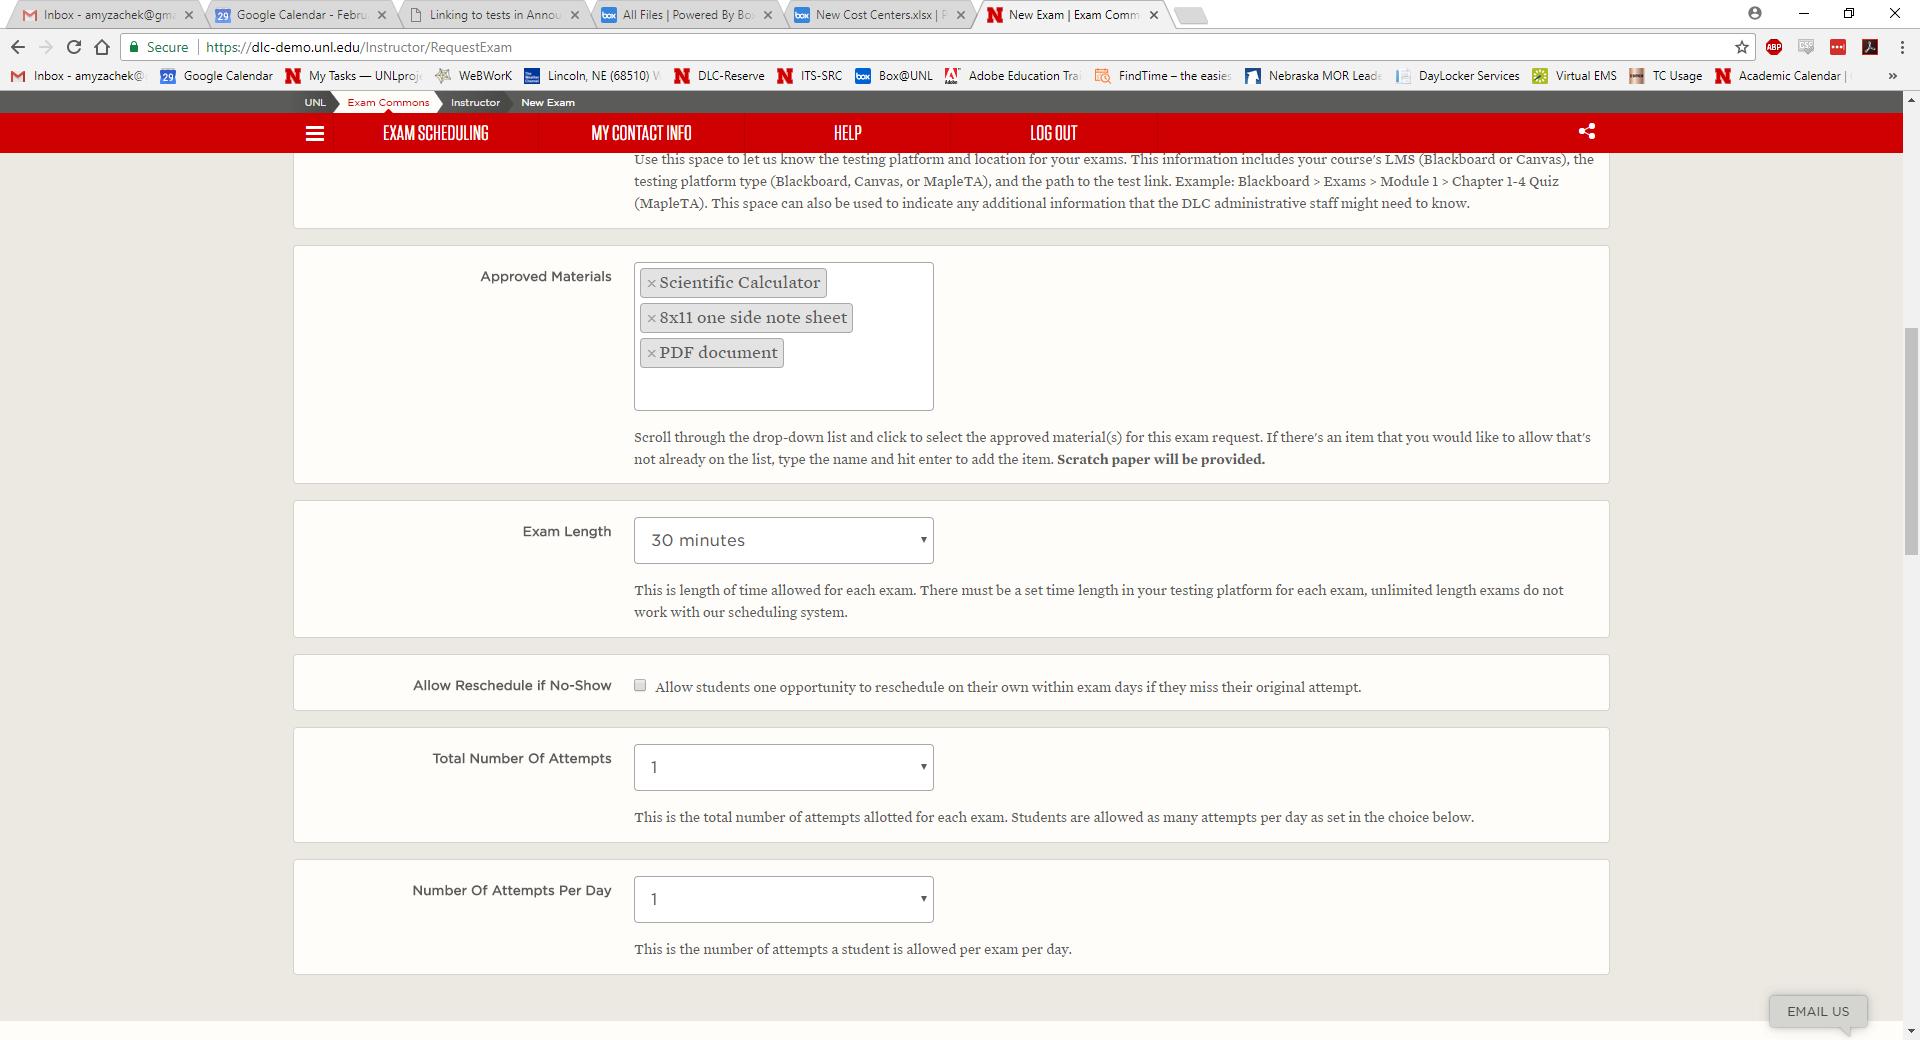 Linking PDF documents screen capture